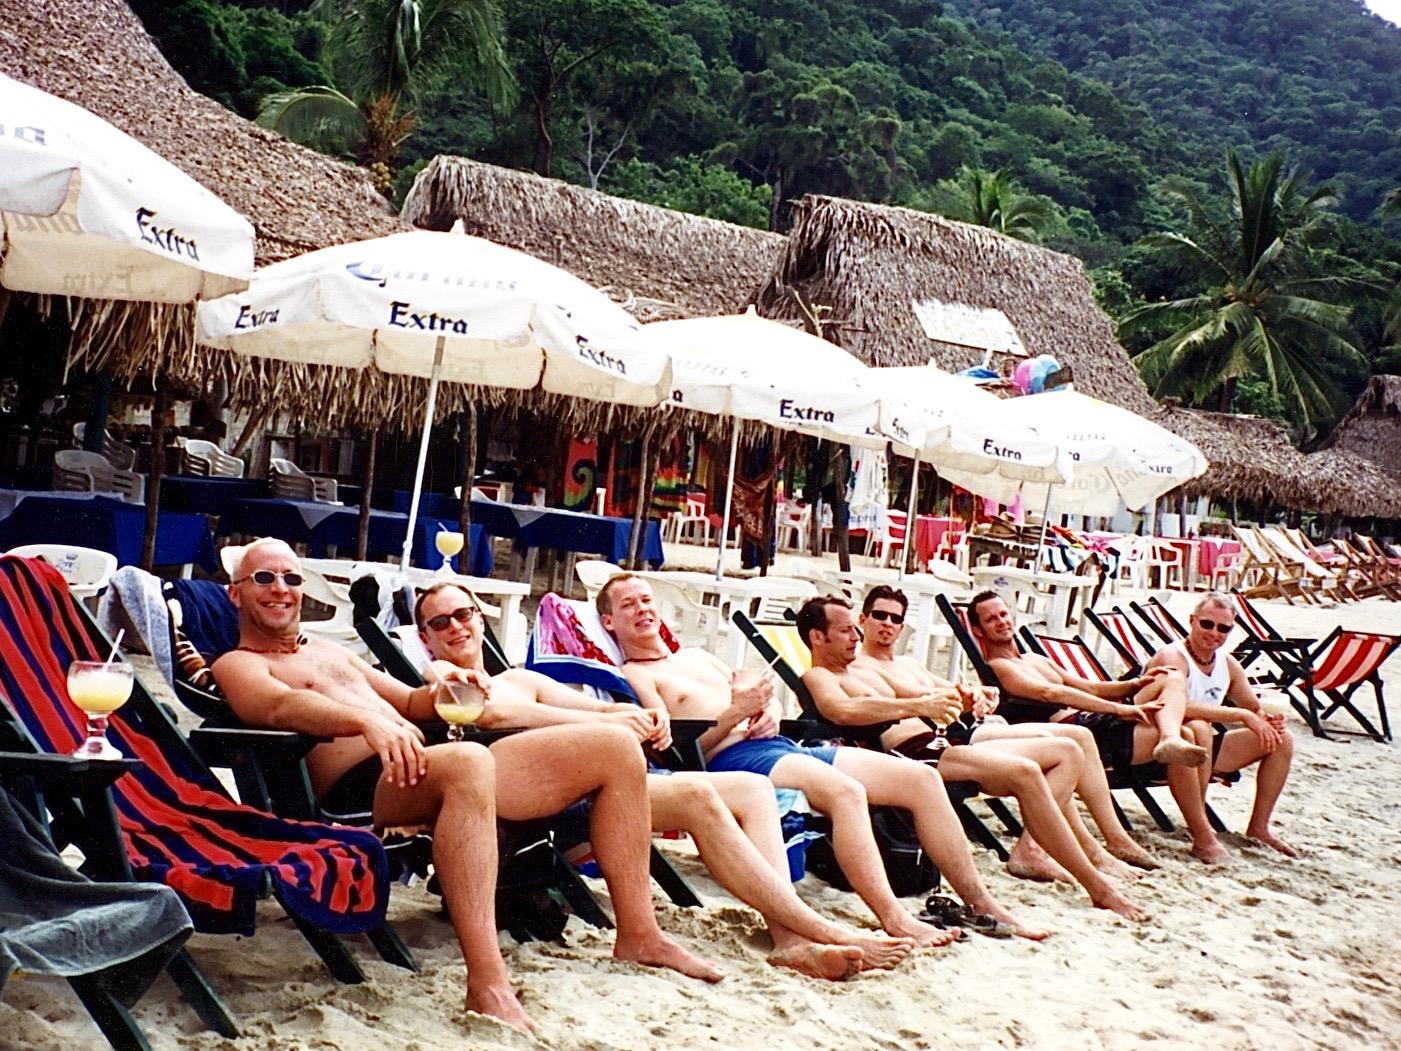 gay men on beach lounge chairs in Puerto Vallarta, Mexico